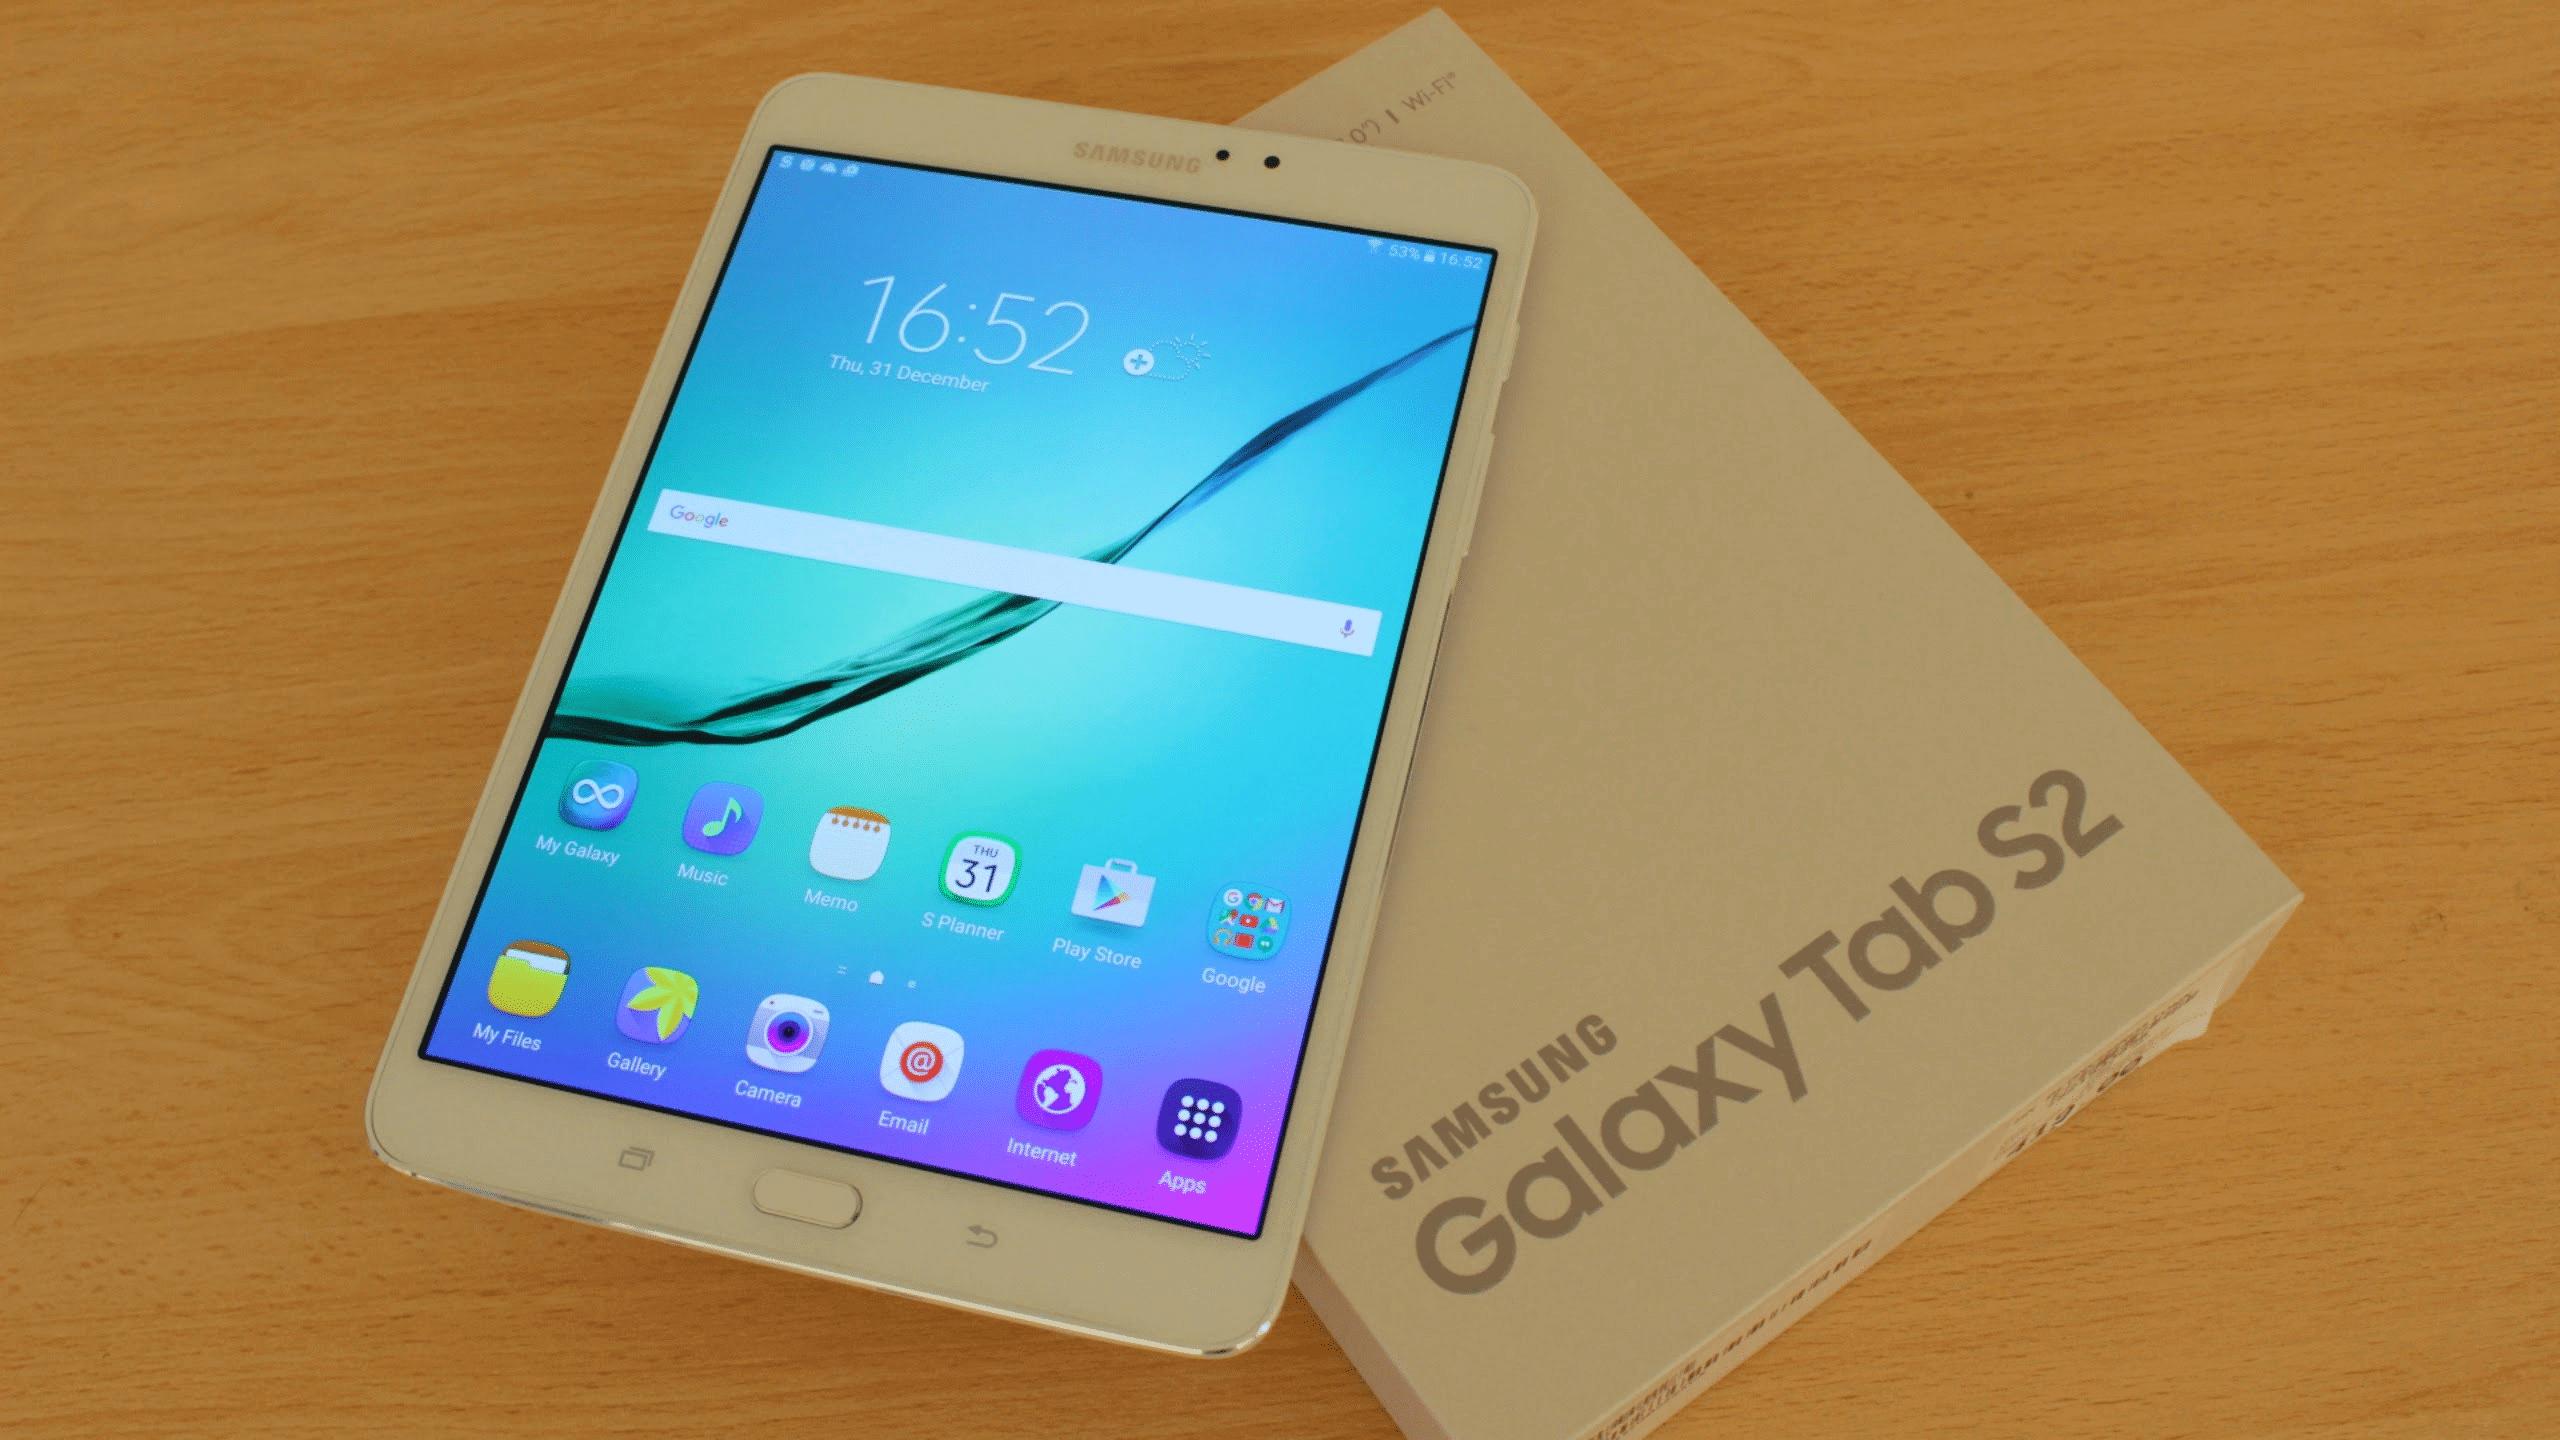 Install Lineage OS 15 Android 8.0 Oreo Custom ROM on Samsung Galaxy Tab S2 8.0 1